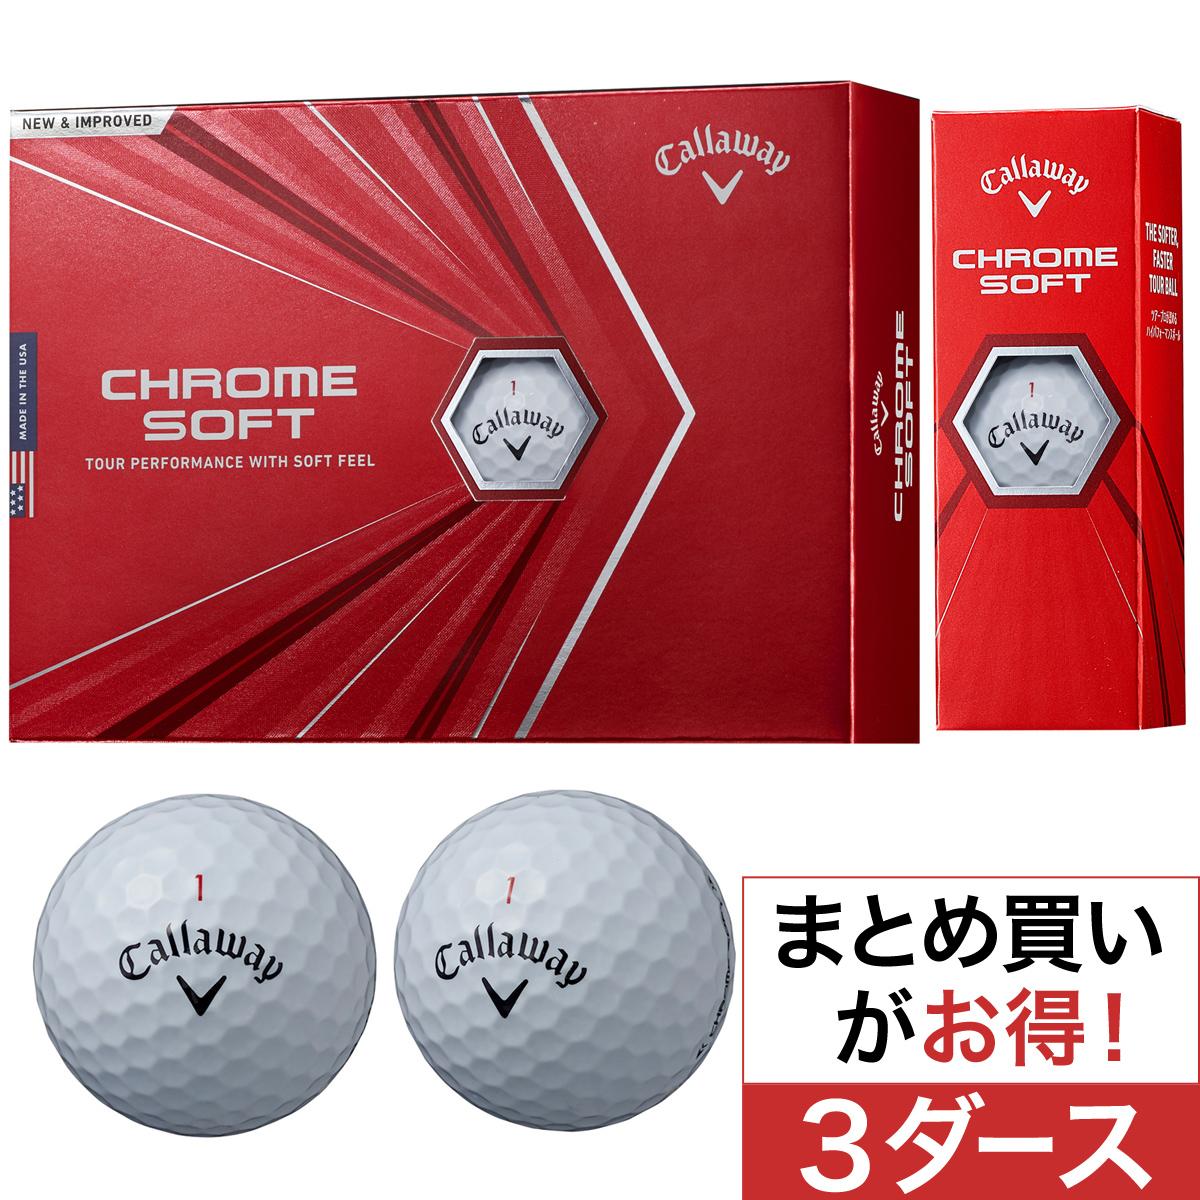 CHROME SOFT ボール 3ダースセット